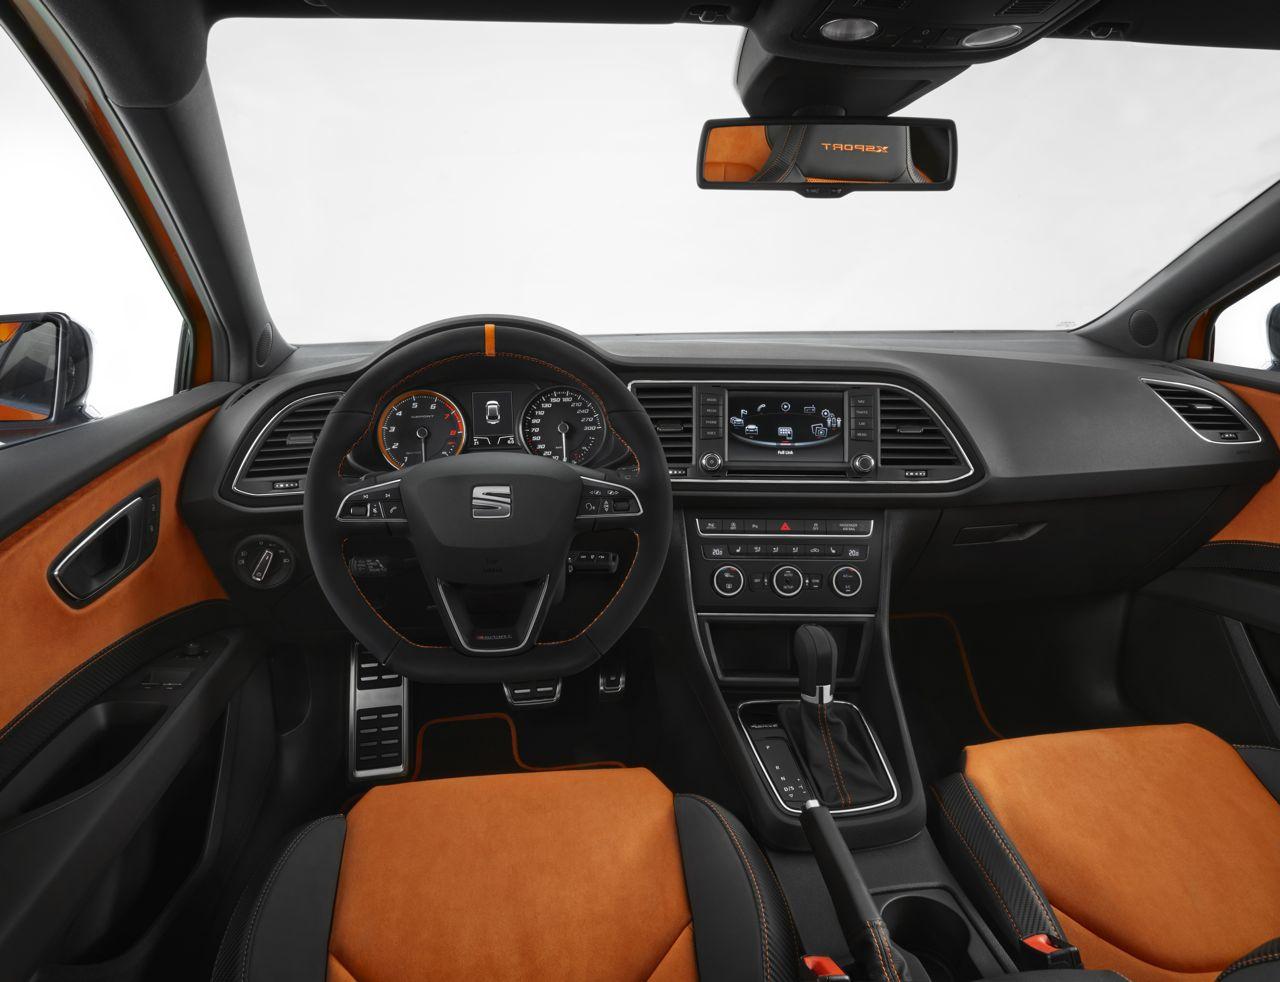 2015 Seat Leon Cross Sport - Autokonzepte